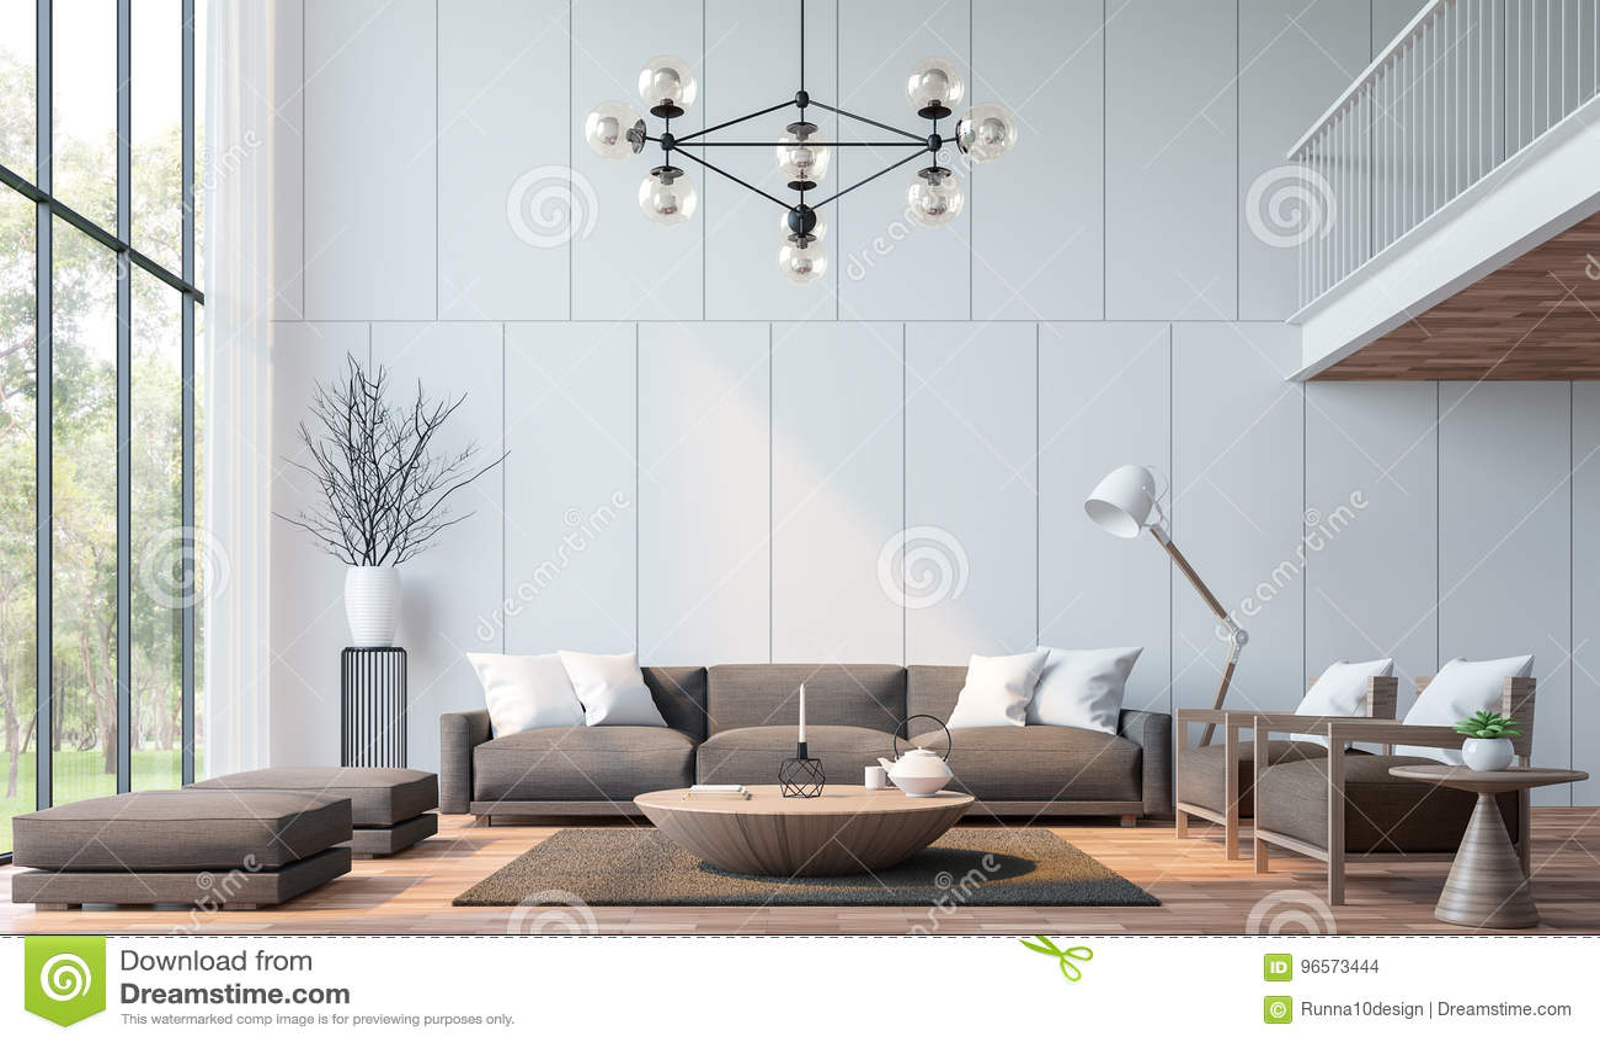 Koraalkleur De Woonkamer : Moderne woonkamer met mezzanine d teruggevend beeld stock